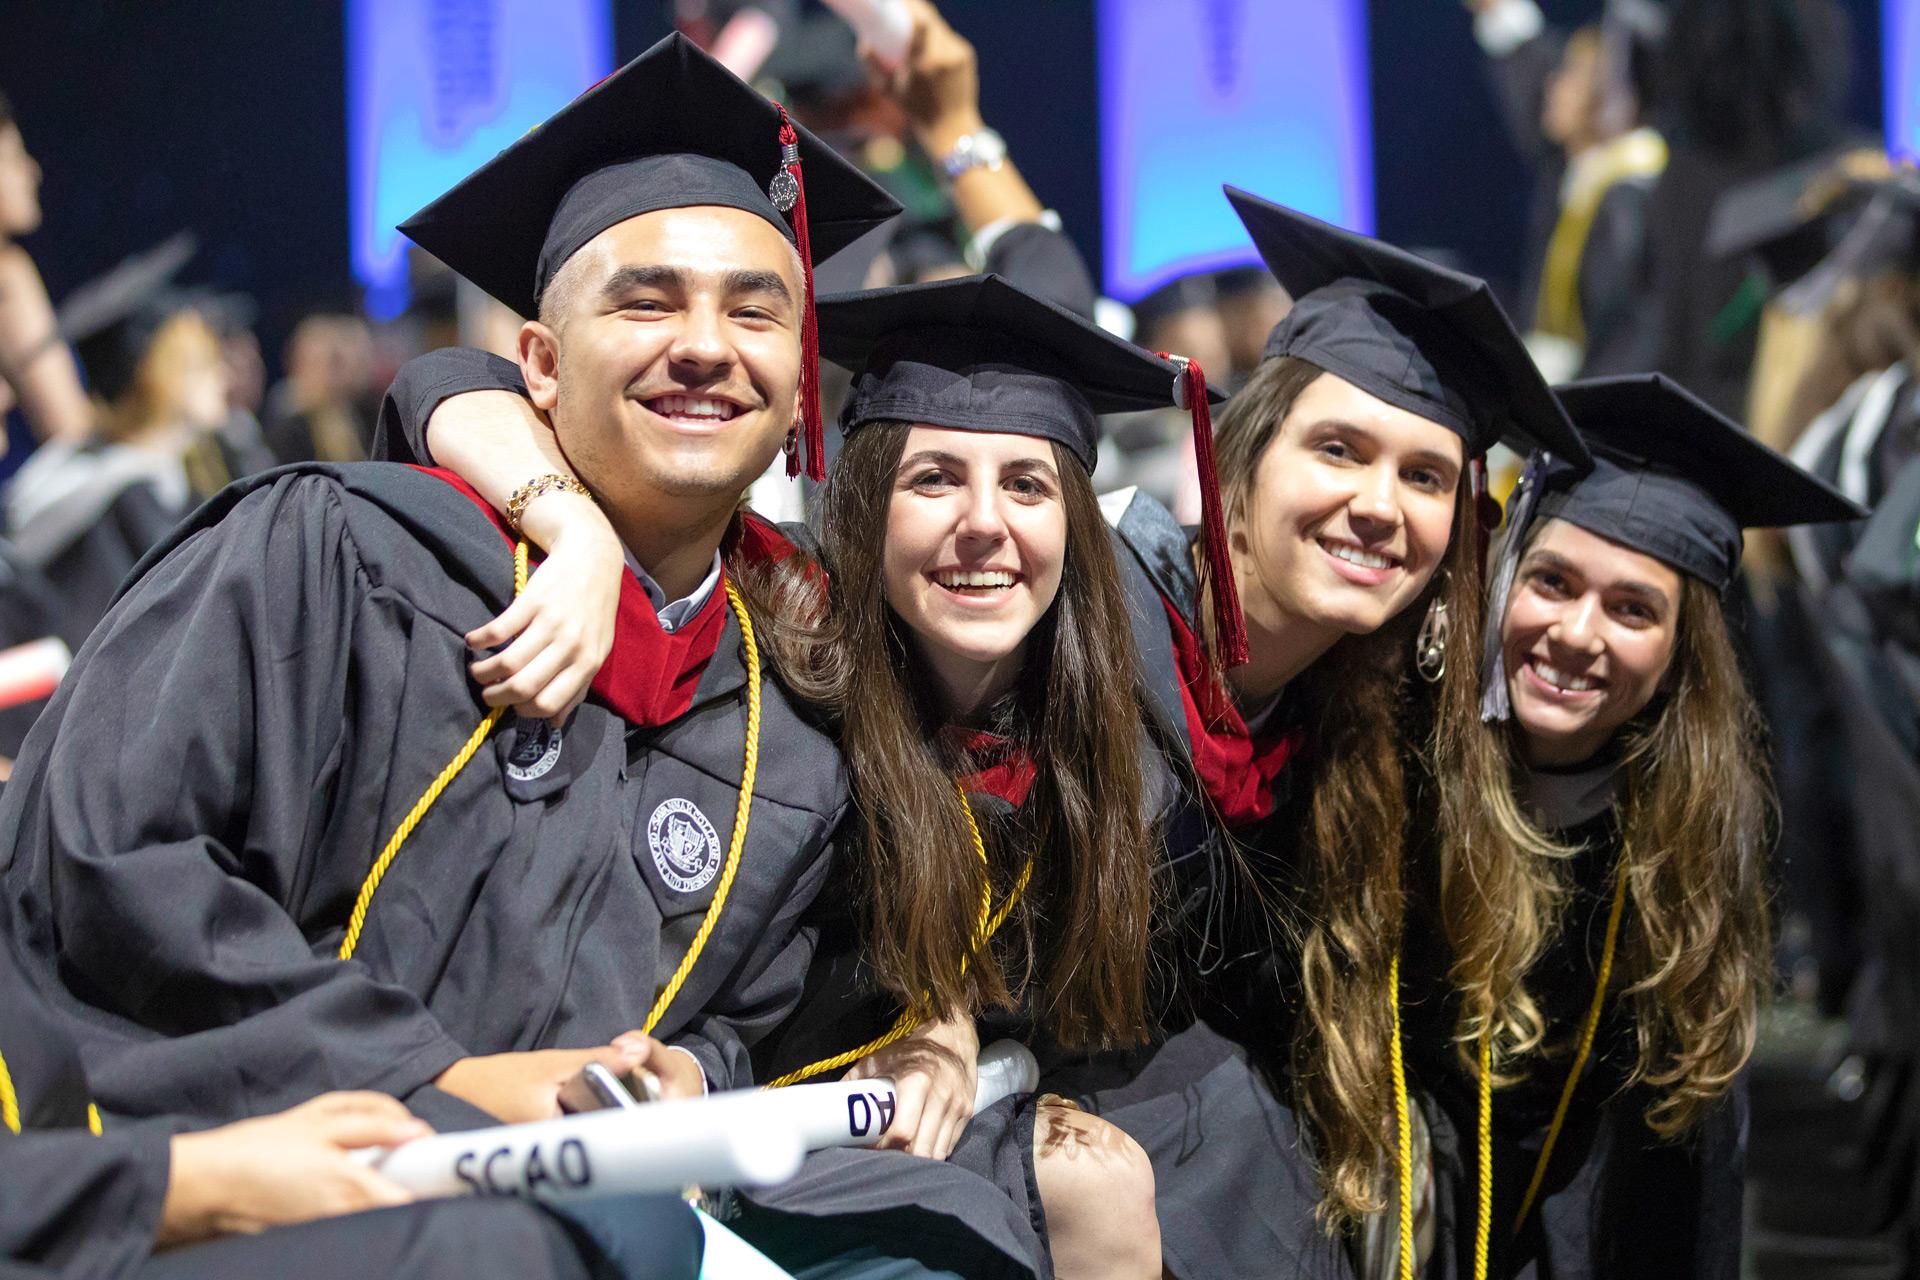 Scad Graduation 2020.Scad 2019 Commencement In Savannah Scad Edu